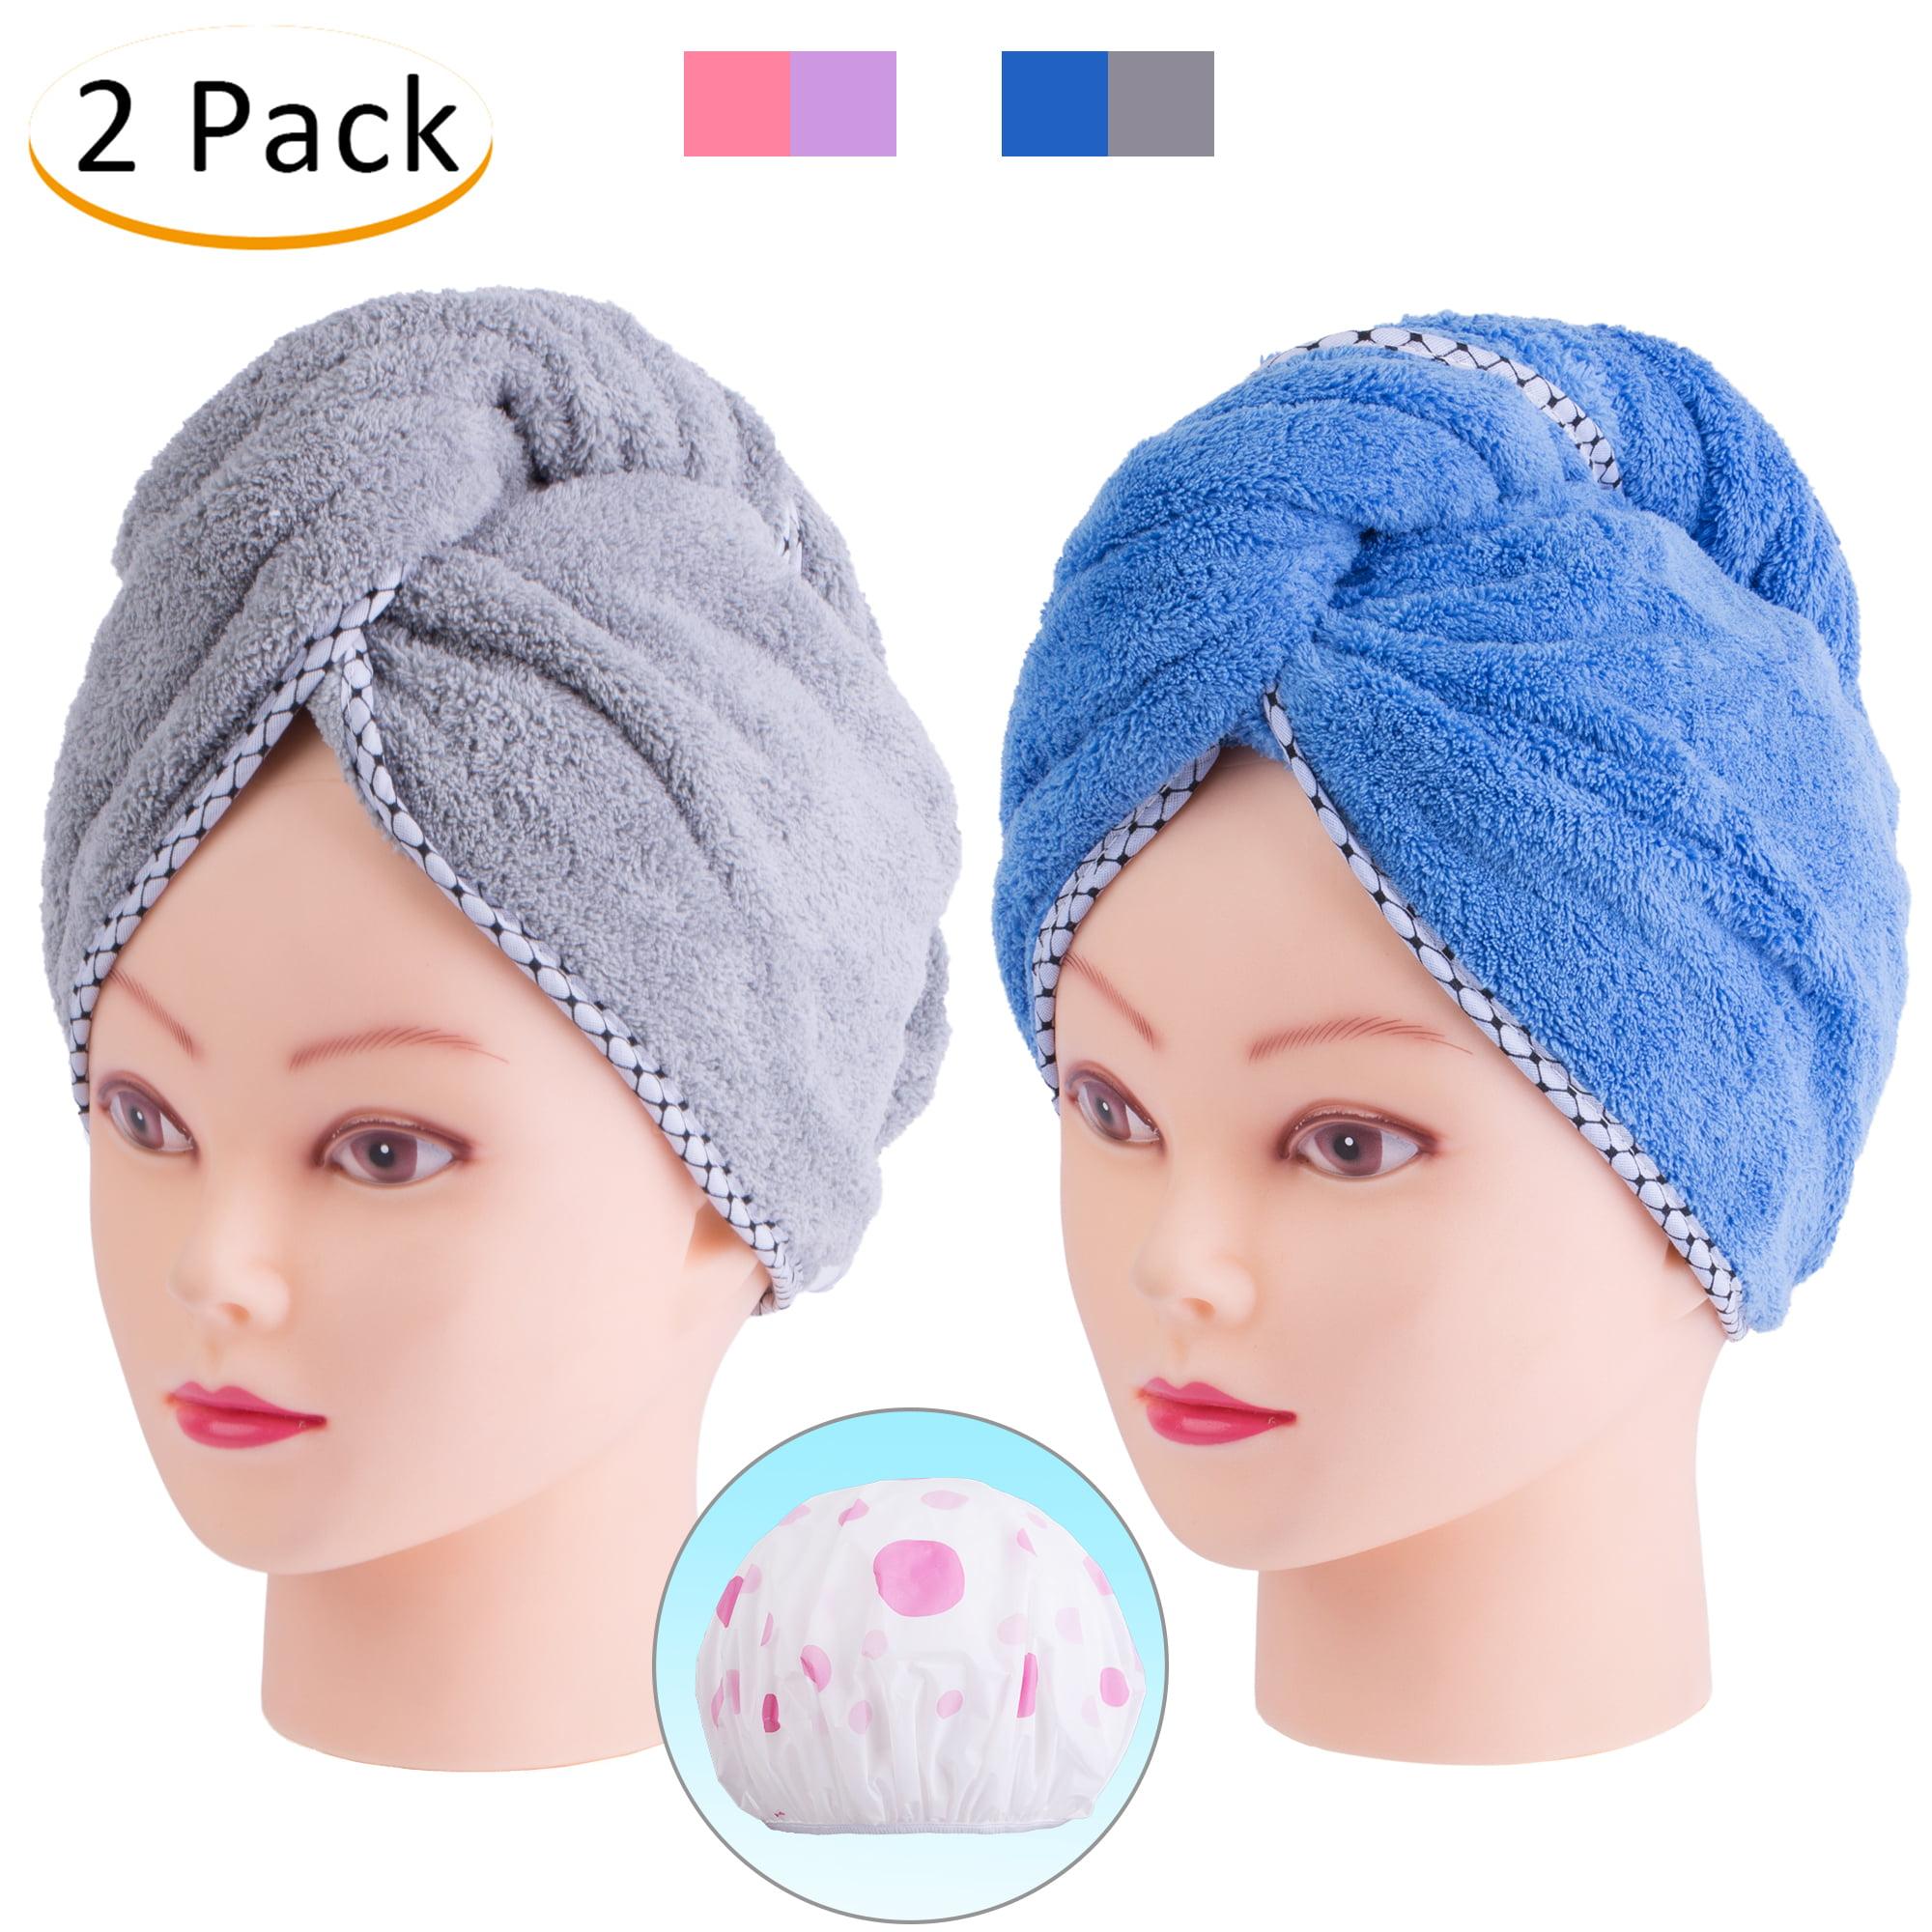 JML Hair Towel Cap Set, Quick Dryer, Pack of 2 Coral Fleece Magic Hair Turban Wrap for Bath Spa Hot Tube and Makeup- Grey+Blue